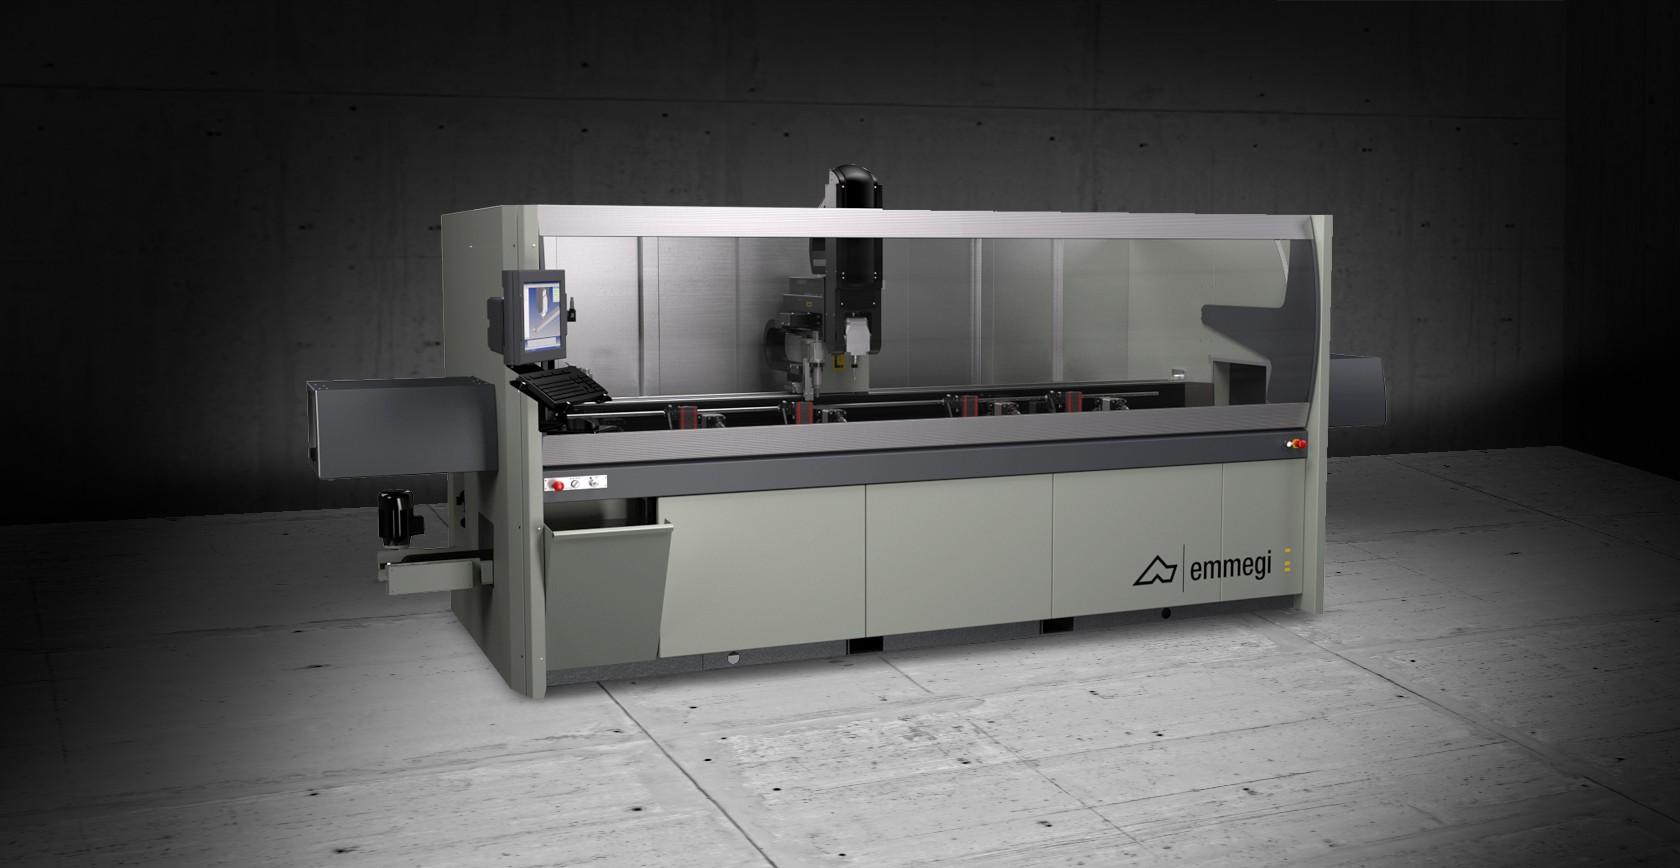 Emmegi  Phantomatic M3